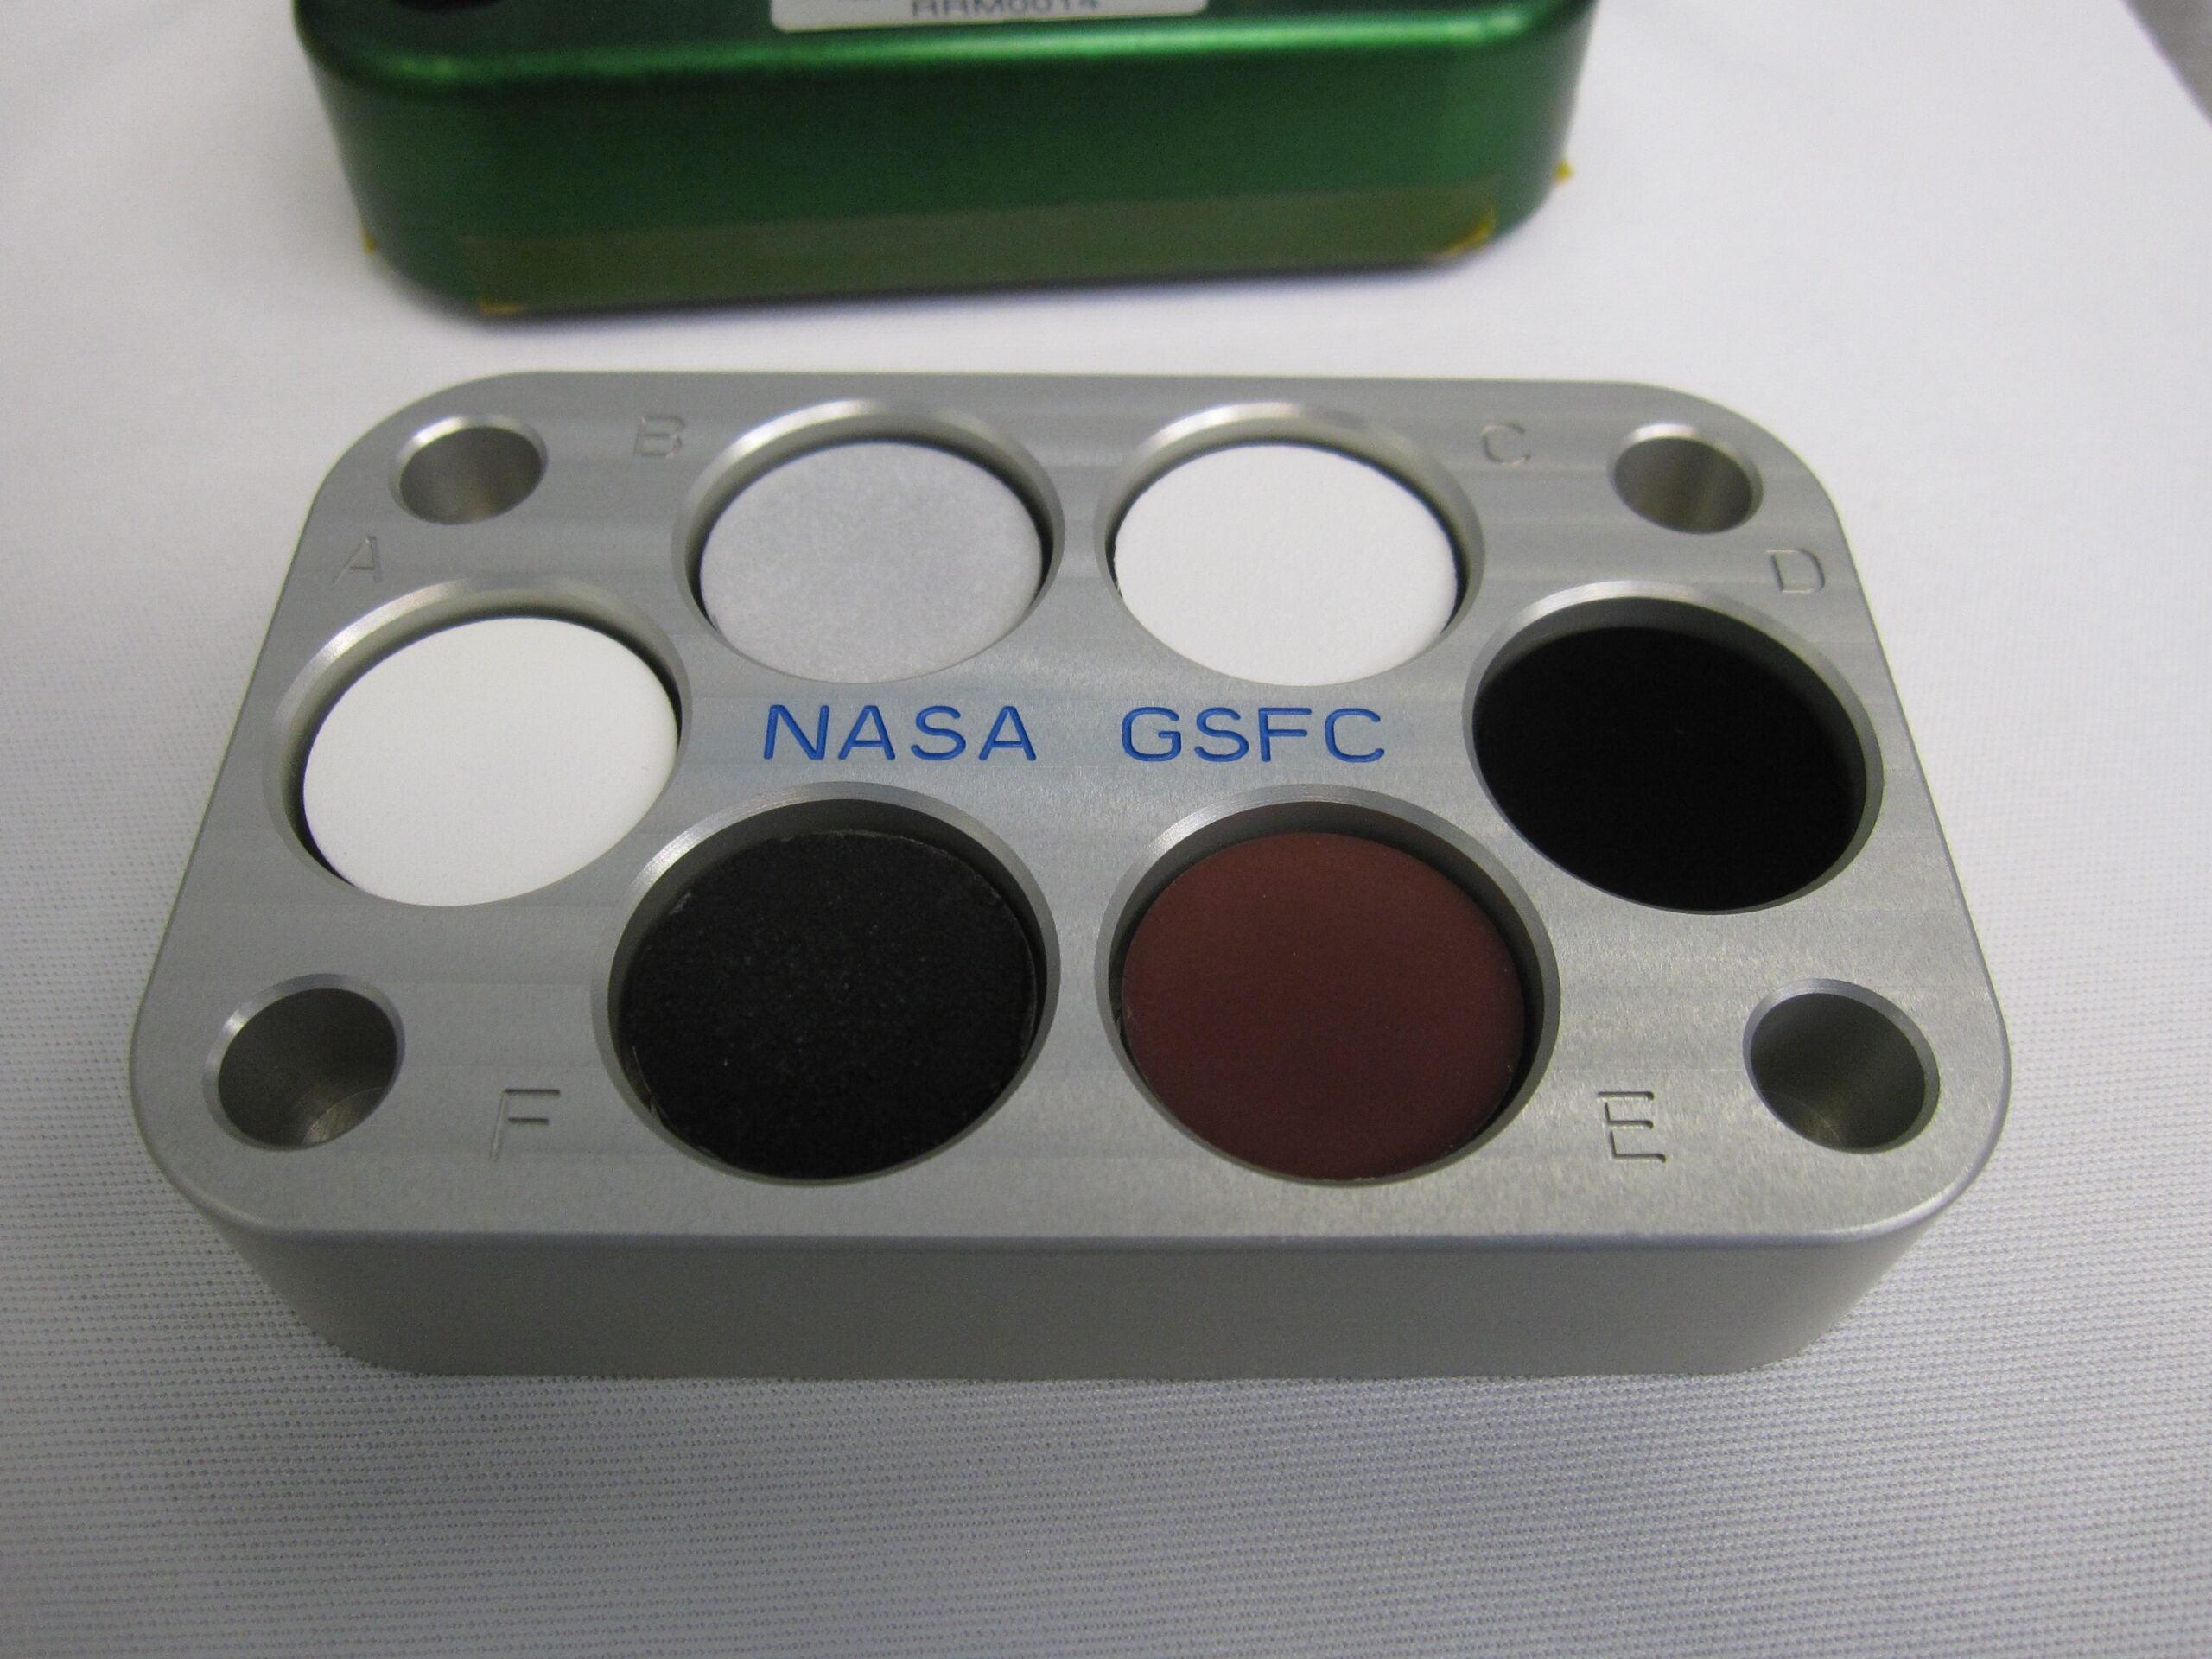 NASA's Super-Black Material Arrives In Space